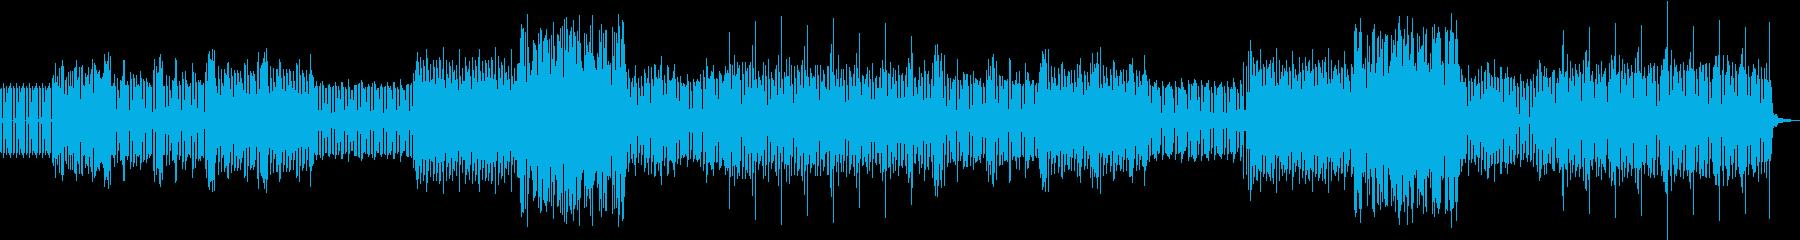 EDMエレクトニックの再生済みの波形